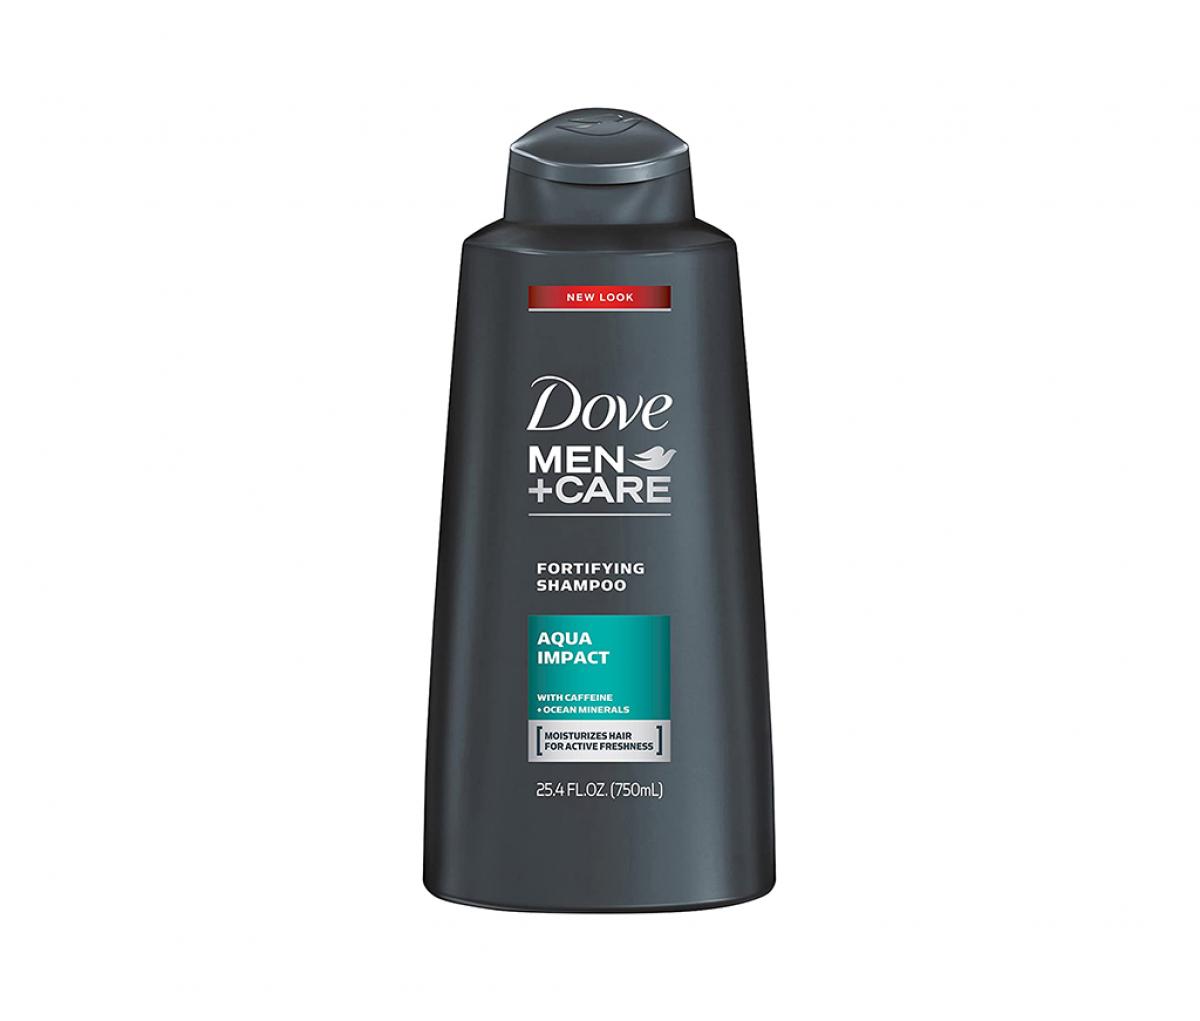 Dove 25.4oz Aqua Impact For Men Shampoo